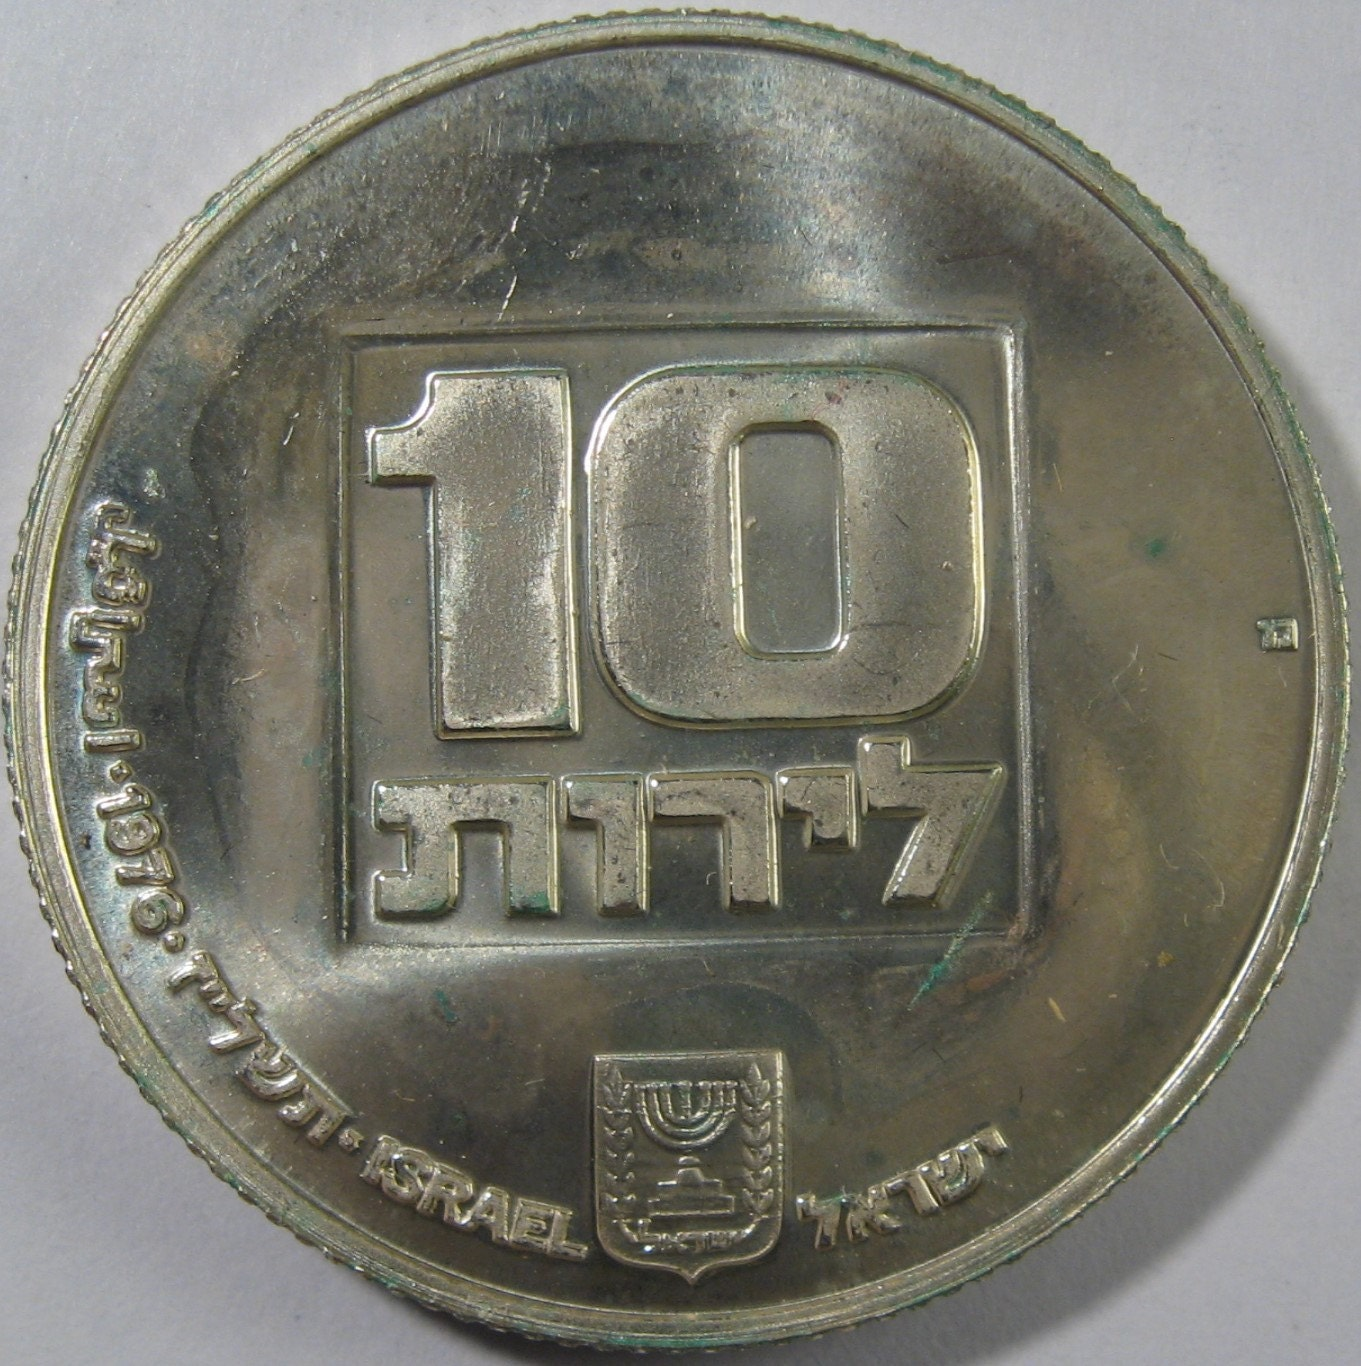 Israel Coin 1976 Israeli 10 Lirot Silver Coin Us Hanukka